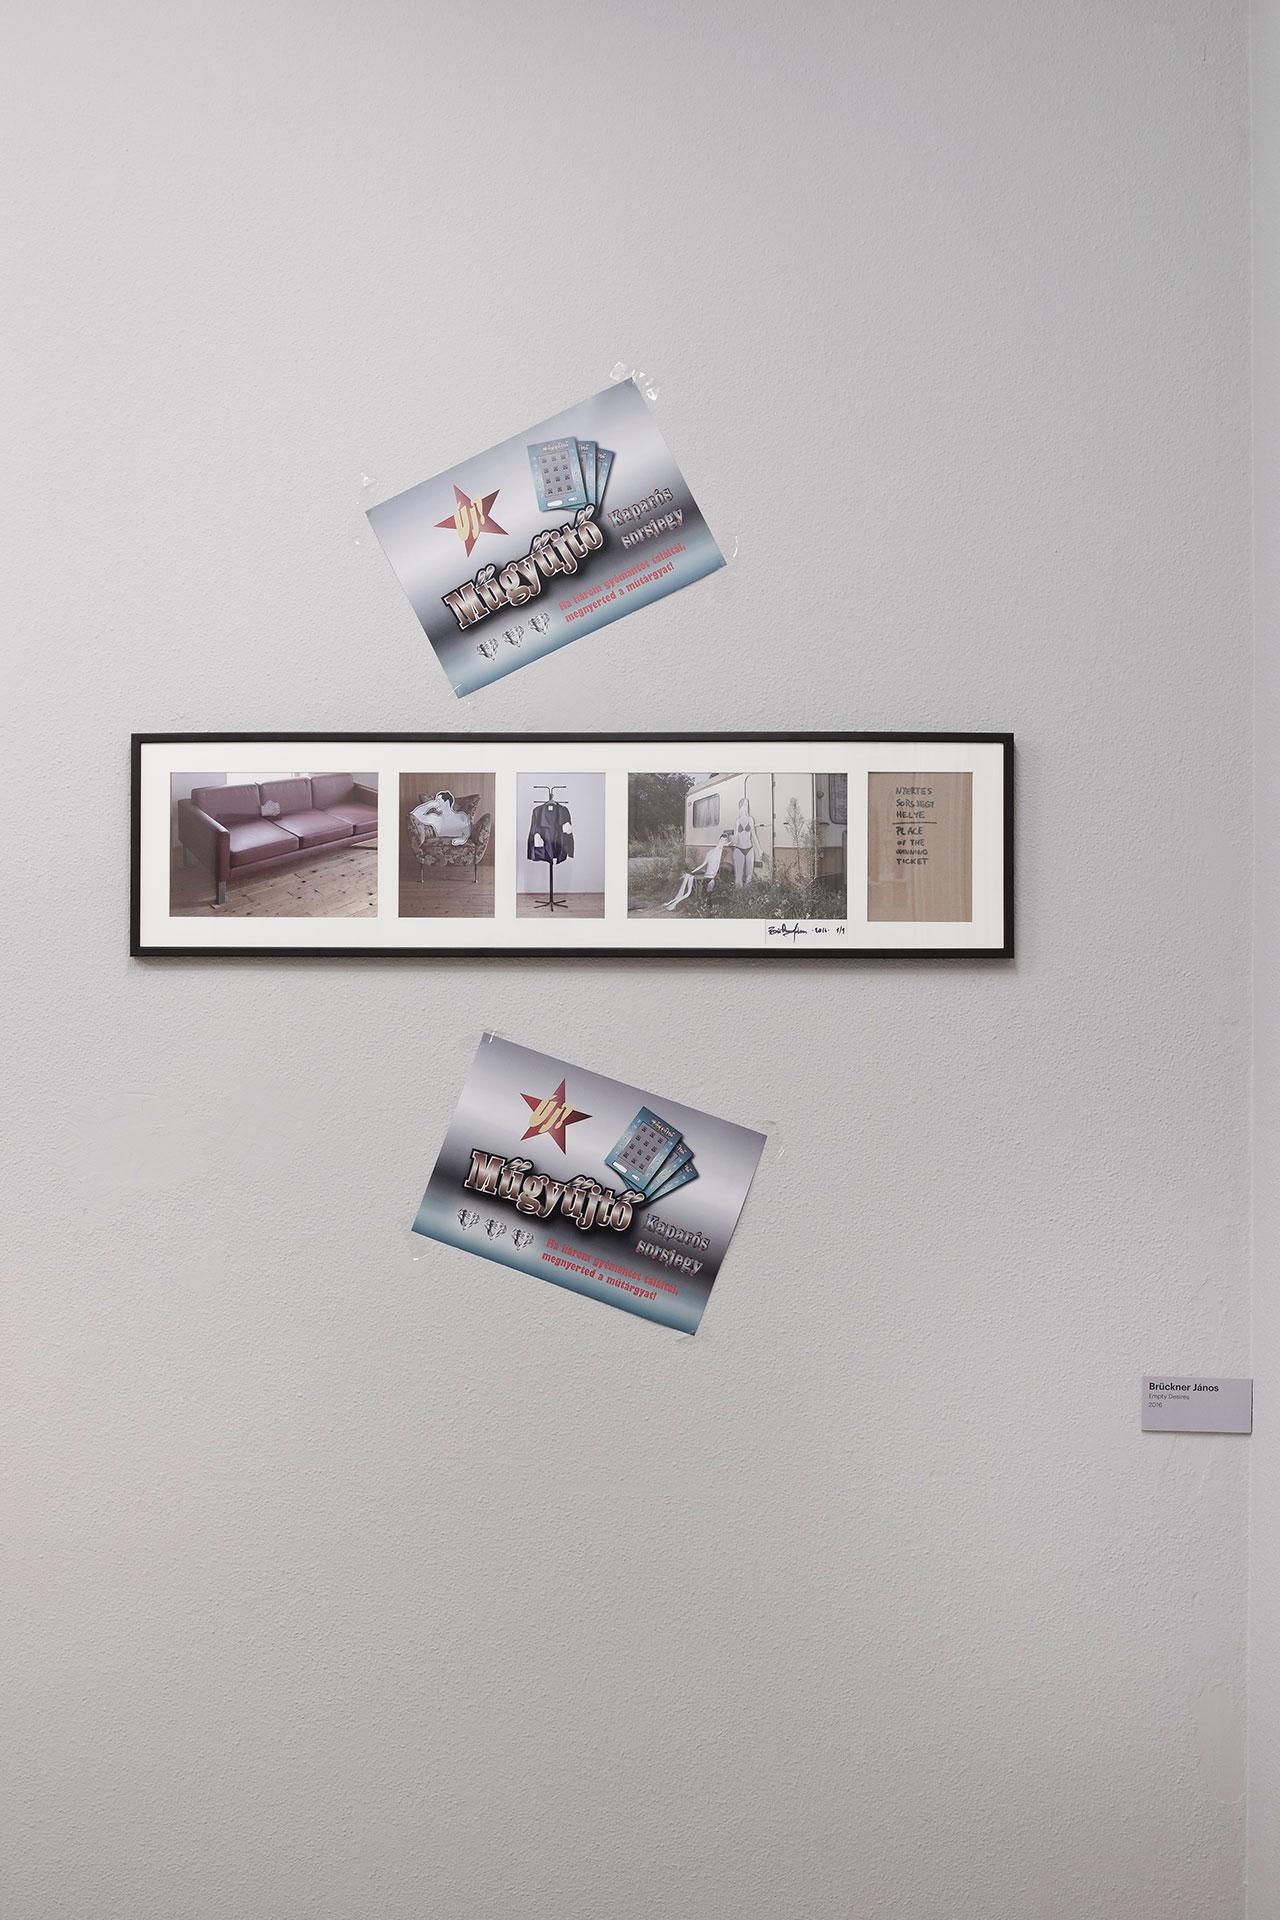 Brückner János Art Collector Scratchcard 2016 interactive installation. Photo byAron Weber.